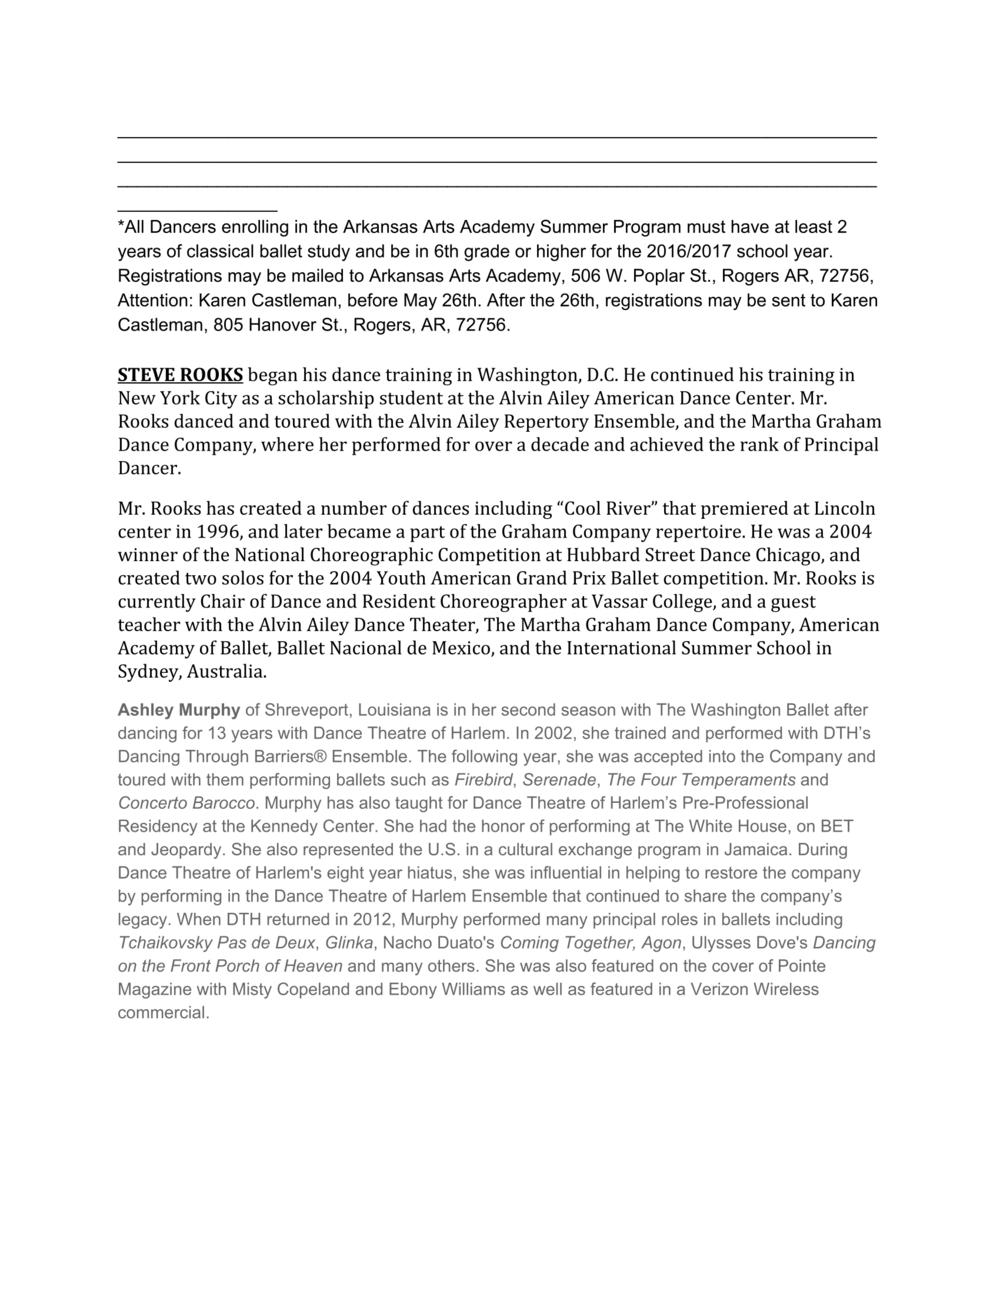 ArkansasArtsAcademySummerDanceProgram-2.png